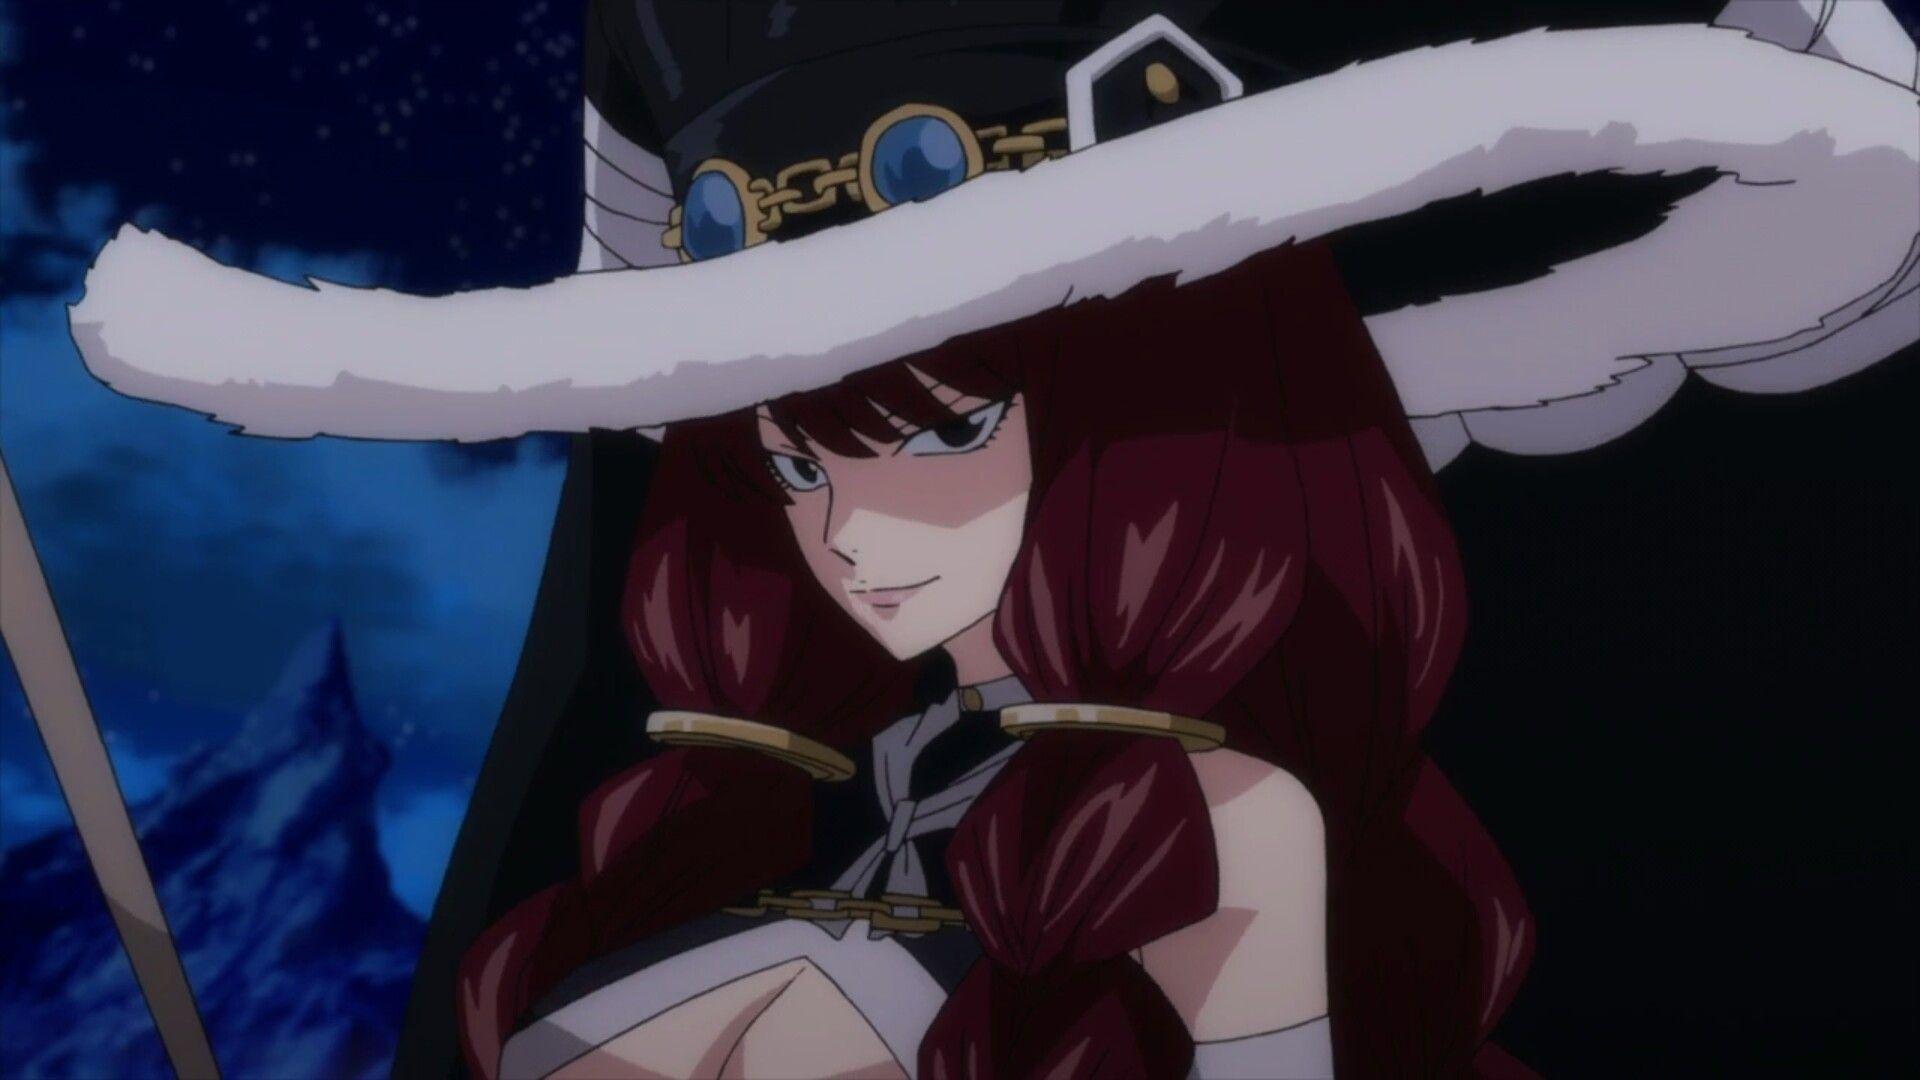 Irene Belserion    Fairy Tail   Fairy tail art, Fairy tail anime, Fairy tail